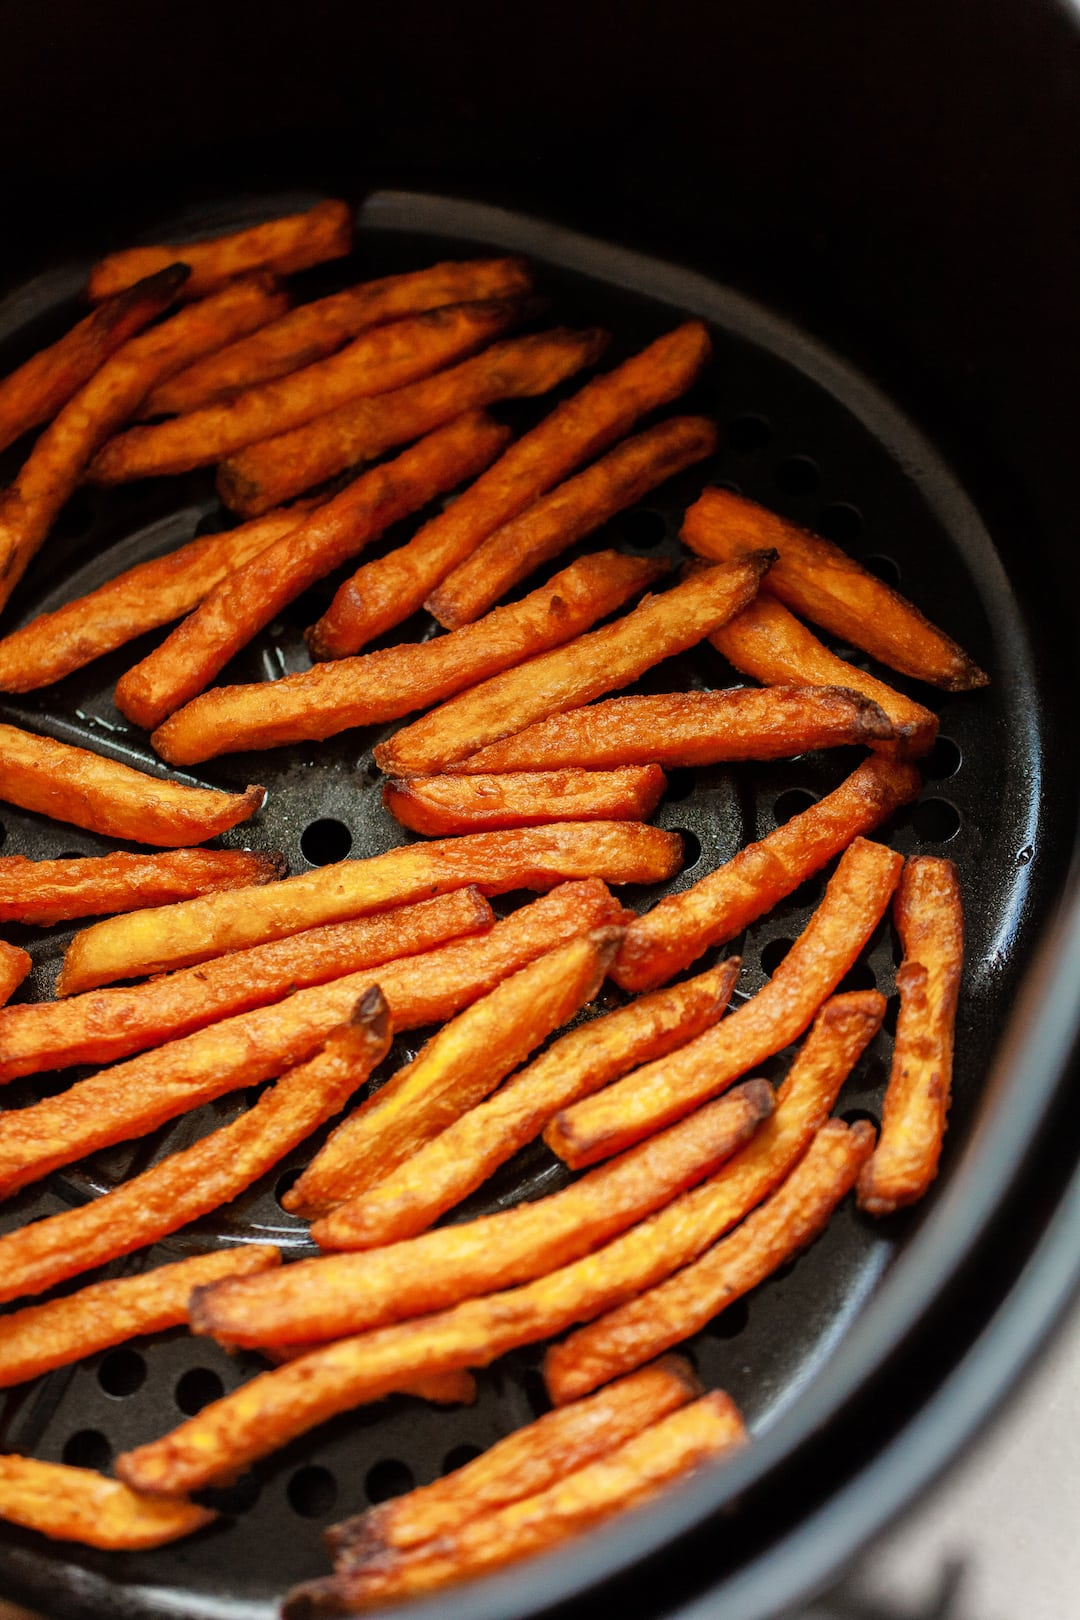 cooked frozen sweet potato fries in an air fryer basket